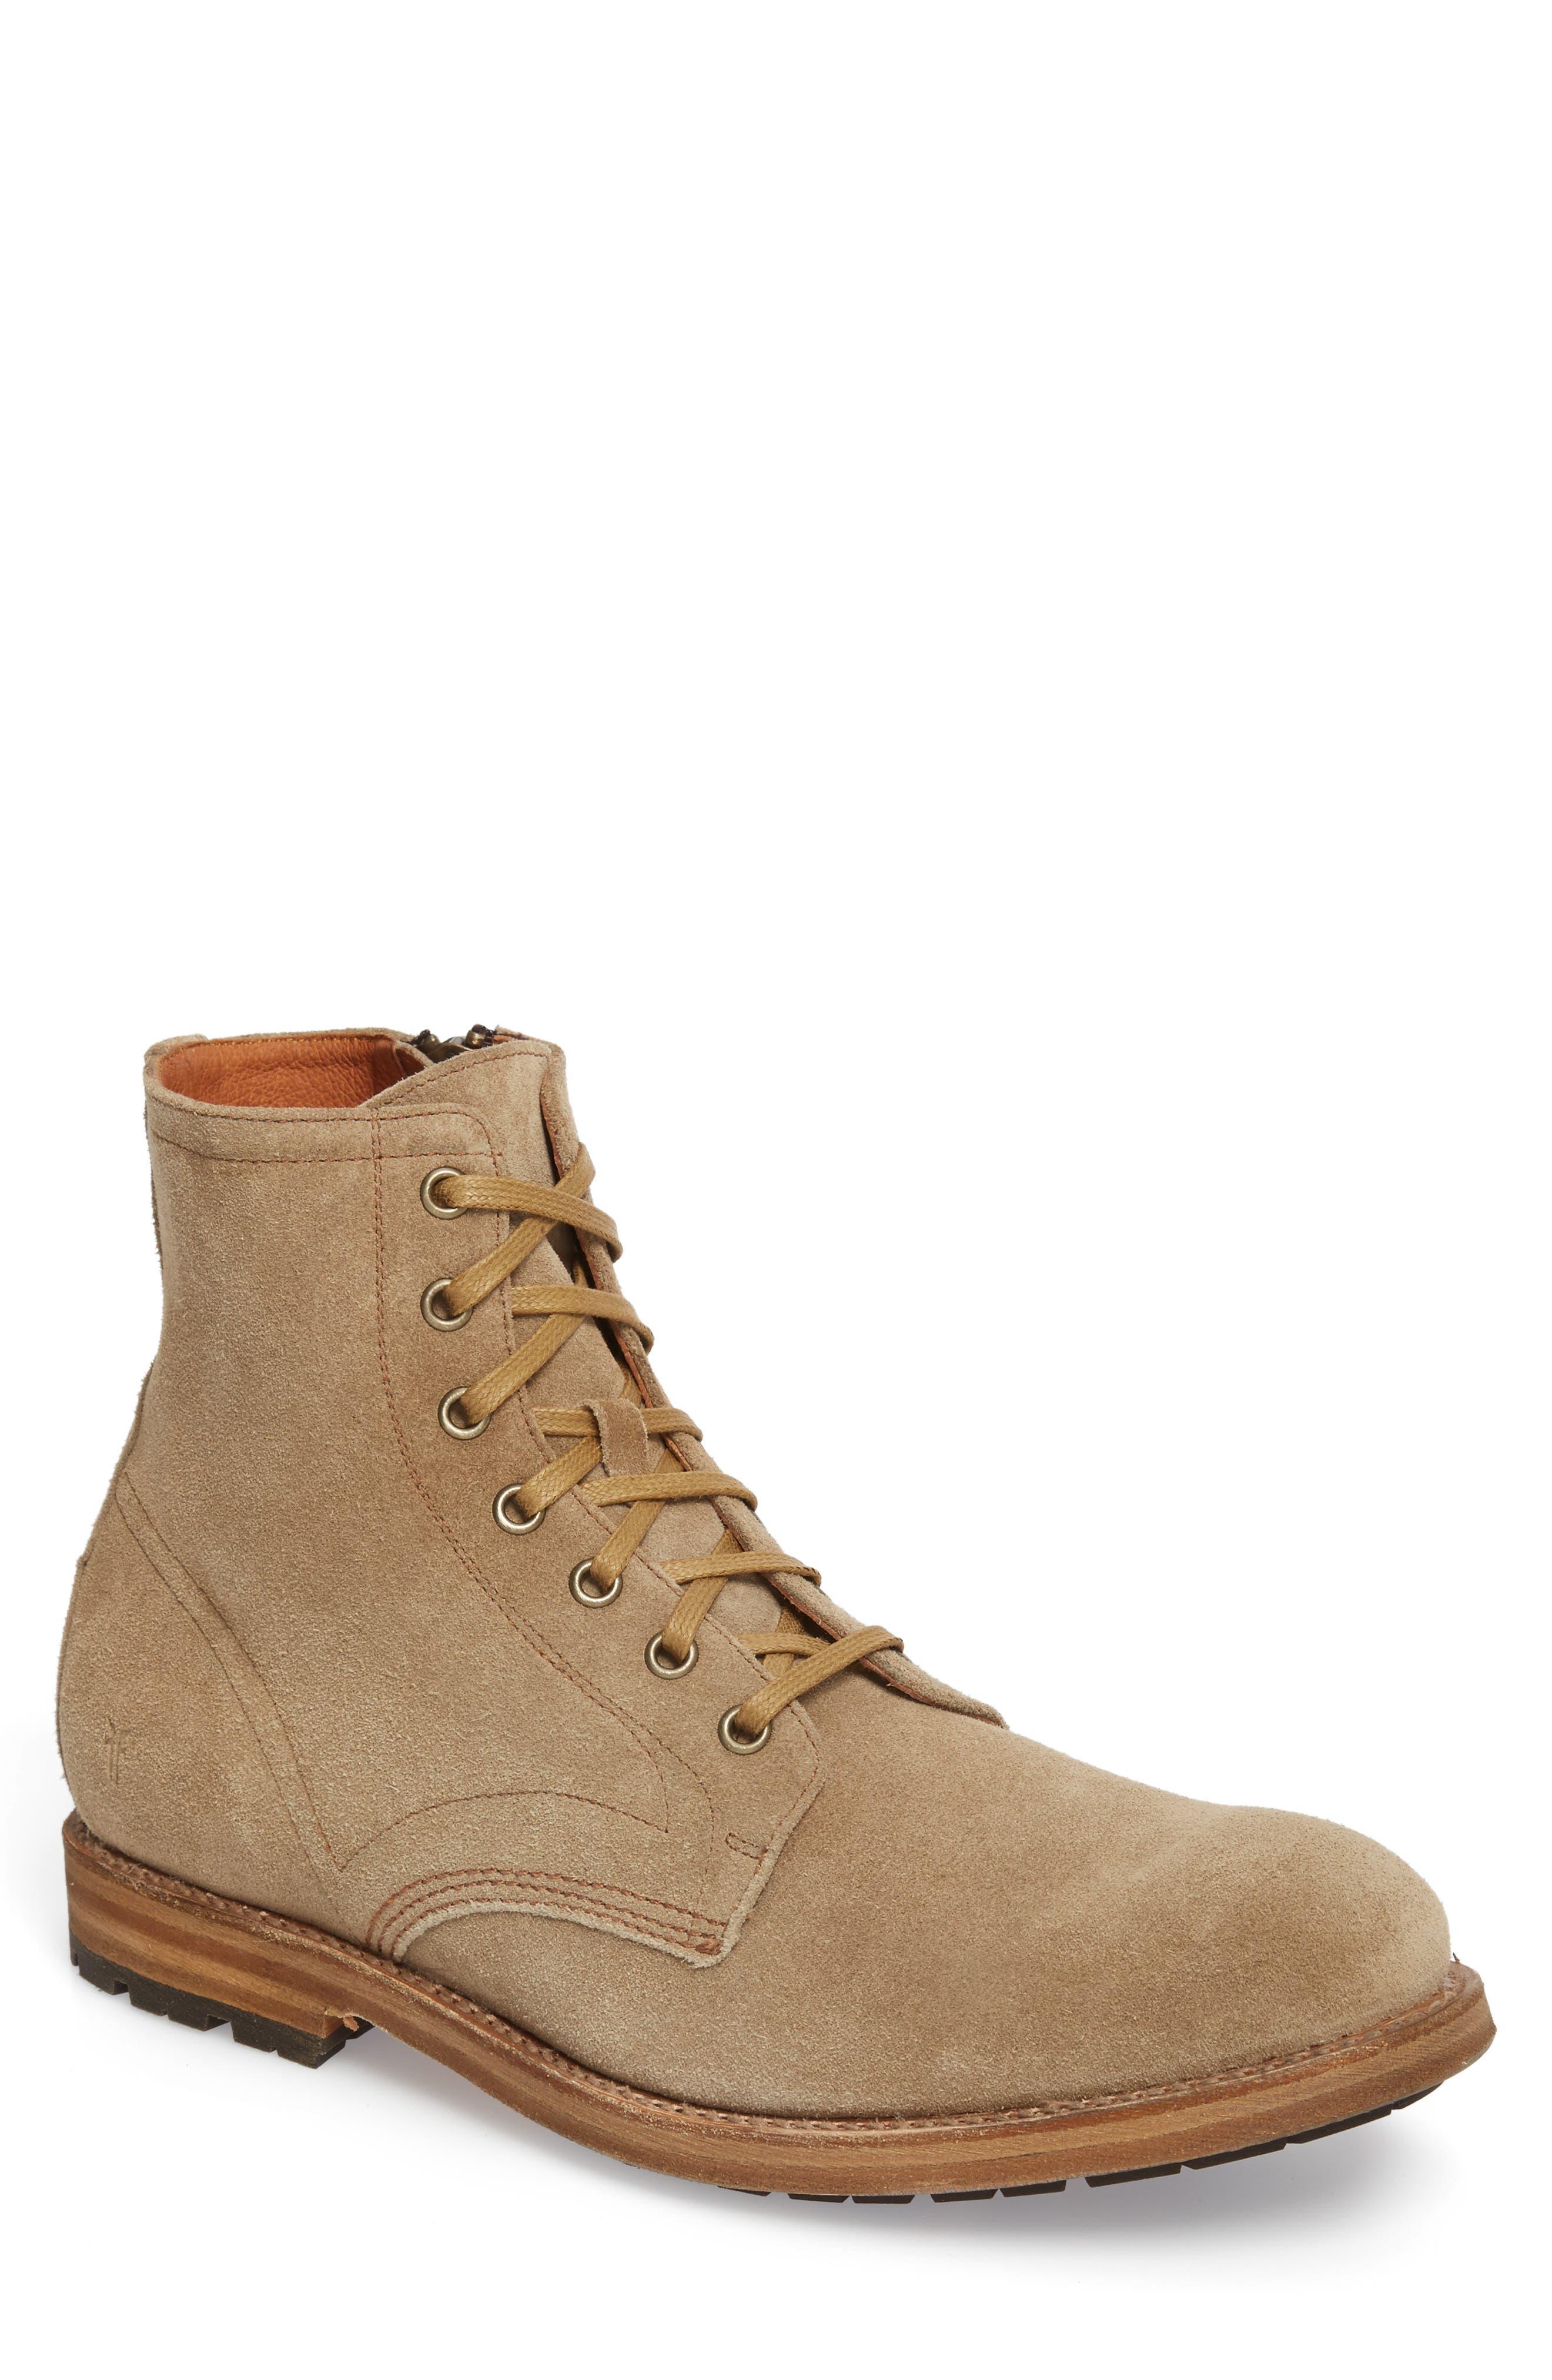 Alternate Image 1 Selected - Fry Bowery Side Zip Combat Boot (Men)